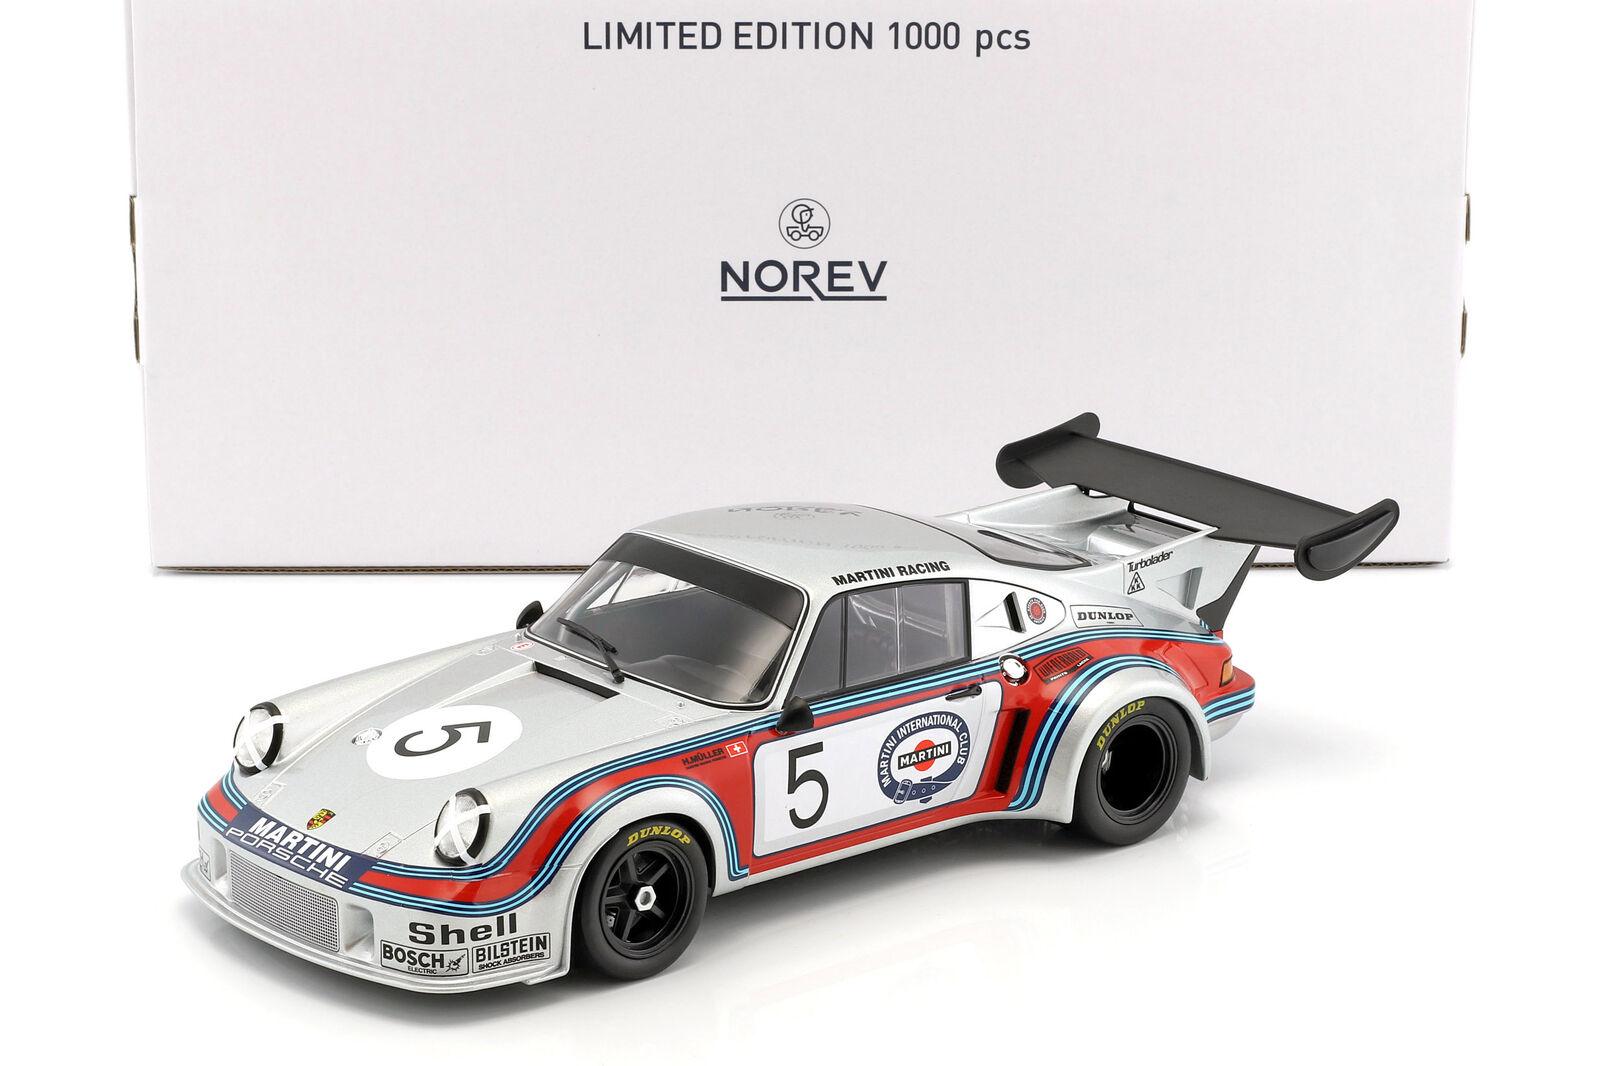 PORSCHE 911 Carrera RSR Turbo 2.1 #5 1000km Brands Hatch 1974 Müller, Van Lenne